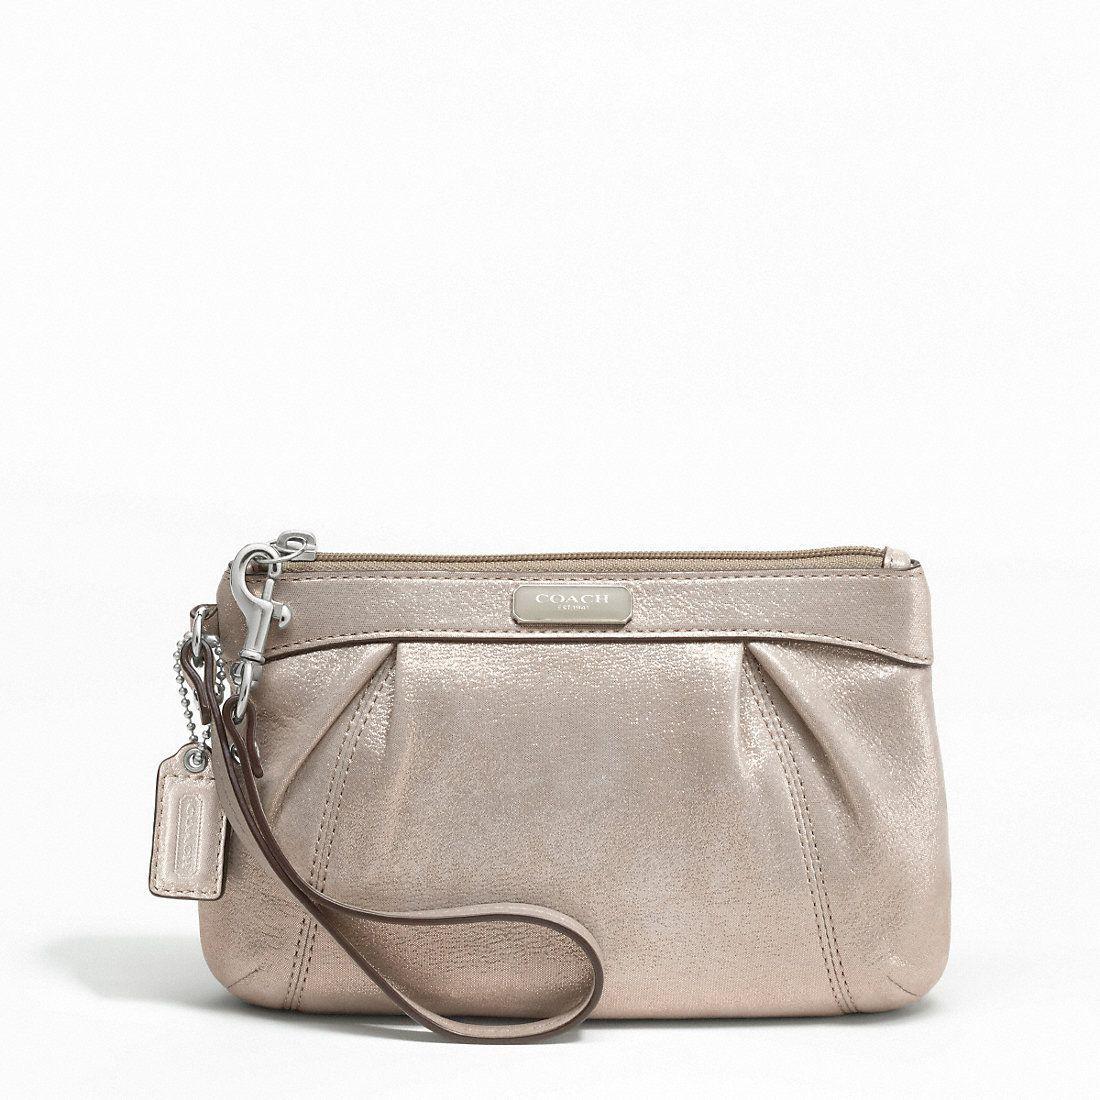 Coach Leather Pleated Medium Wristlet Purse 46484 Pewter Price See